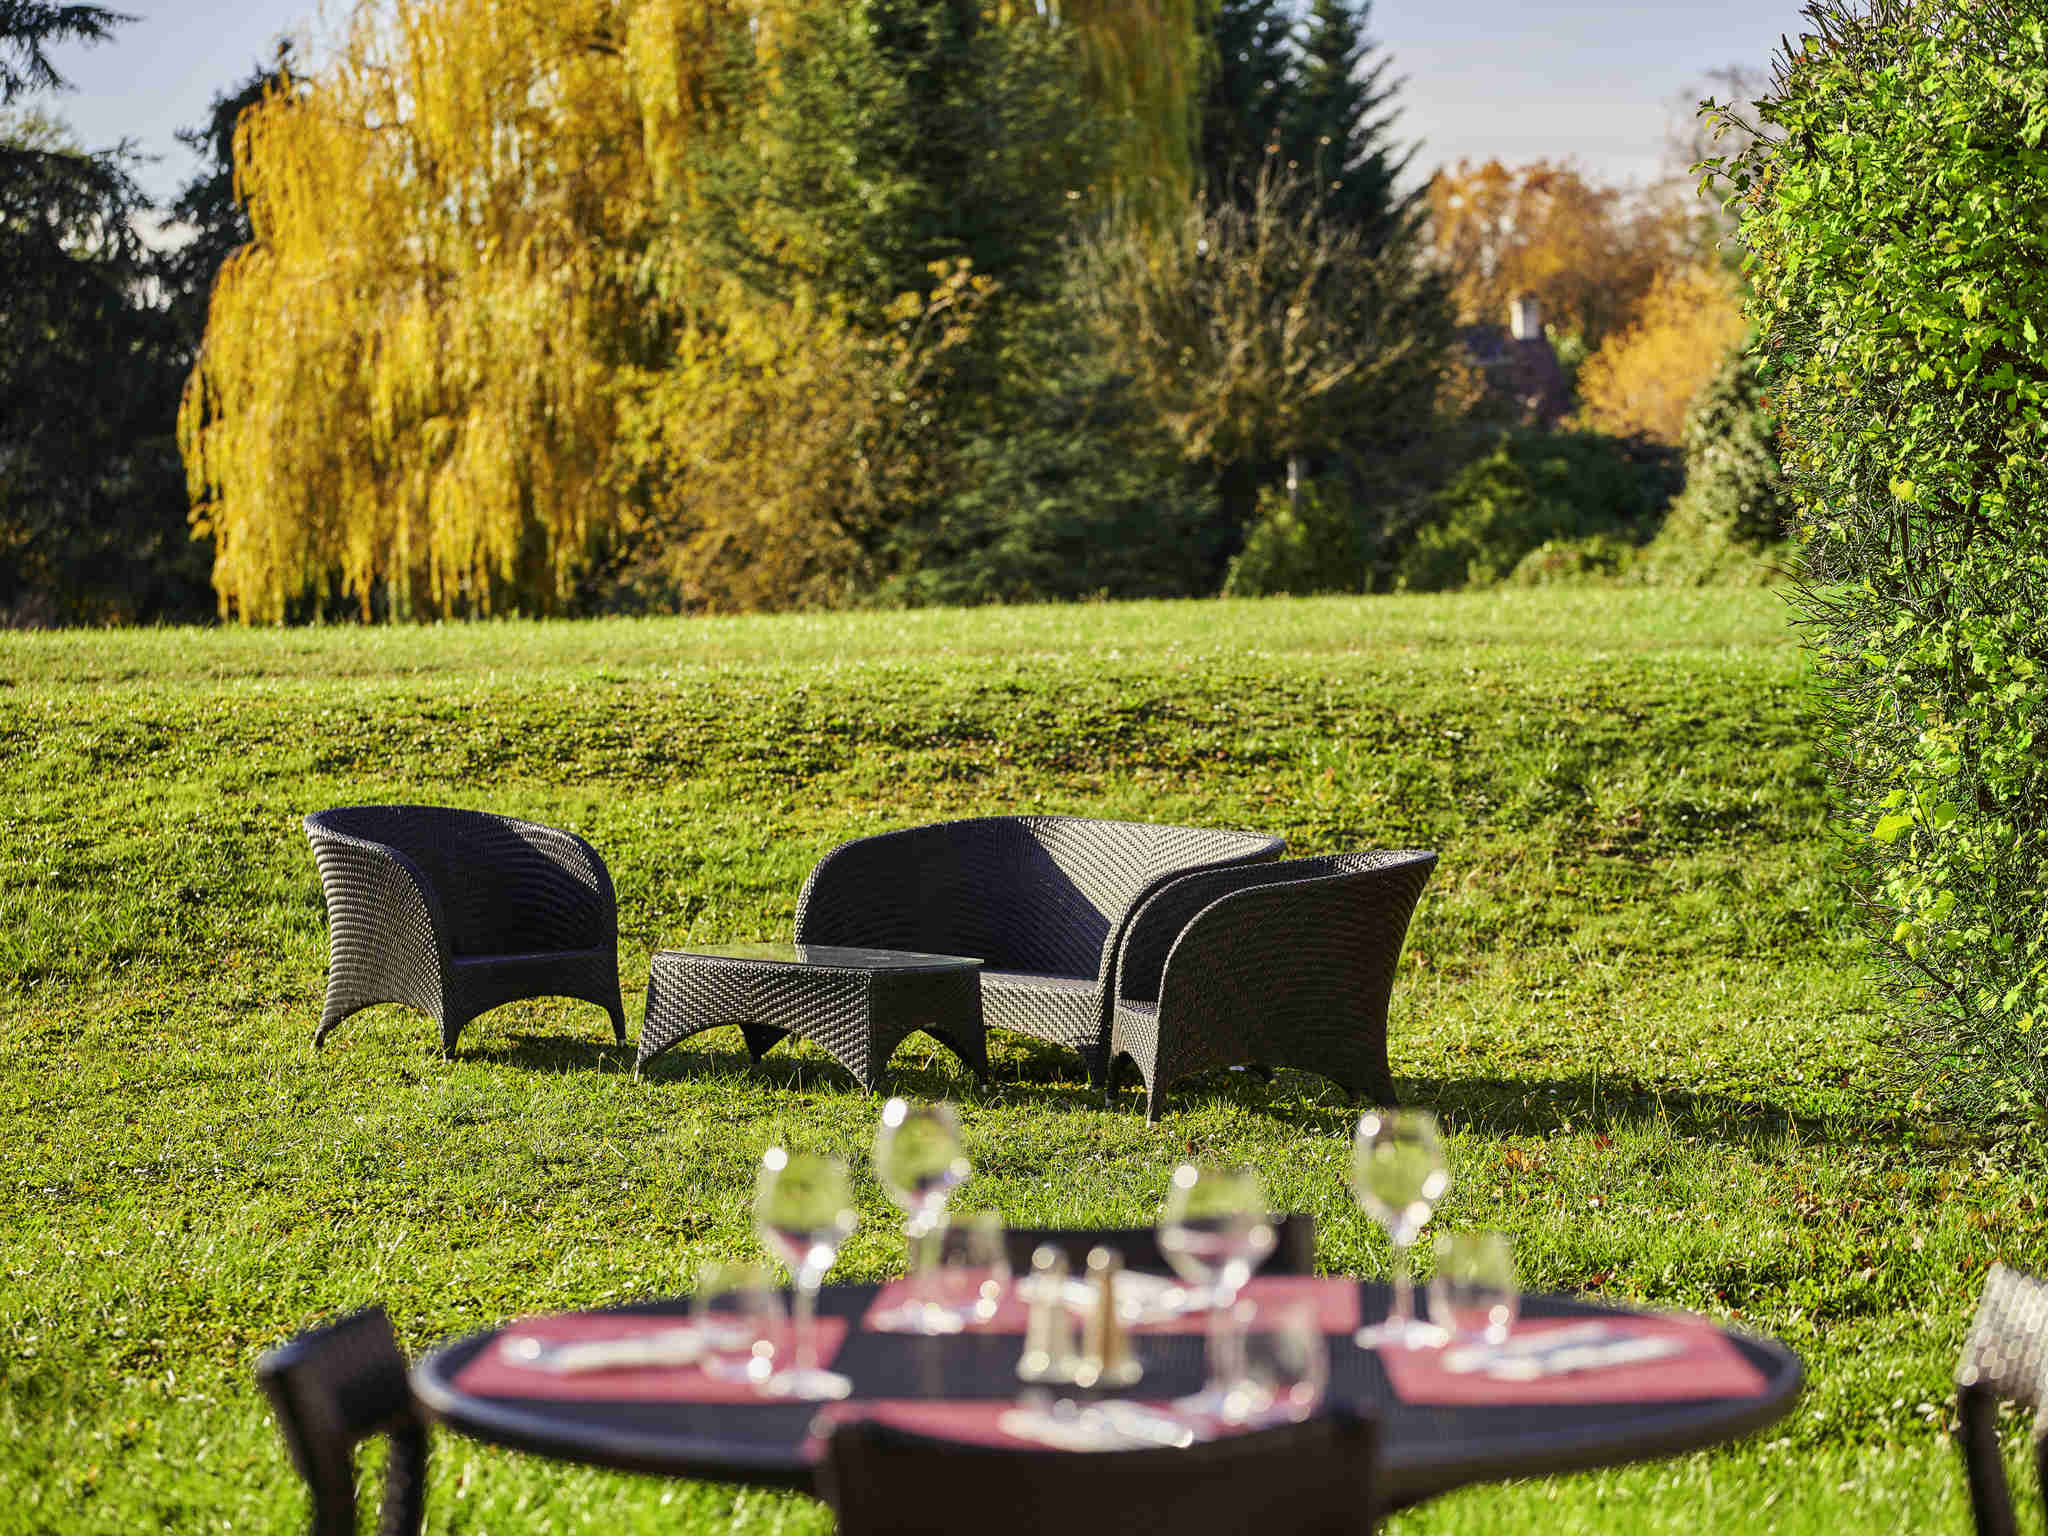 Hotel – Novotel Sénart Golf de Greenparc